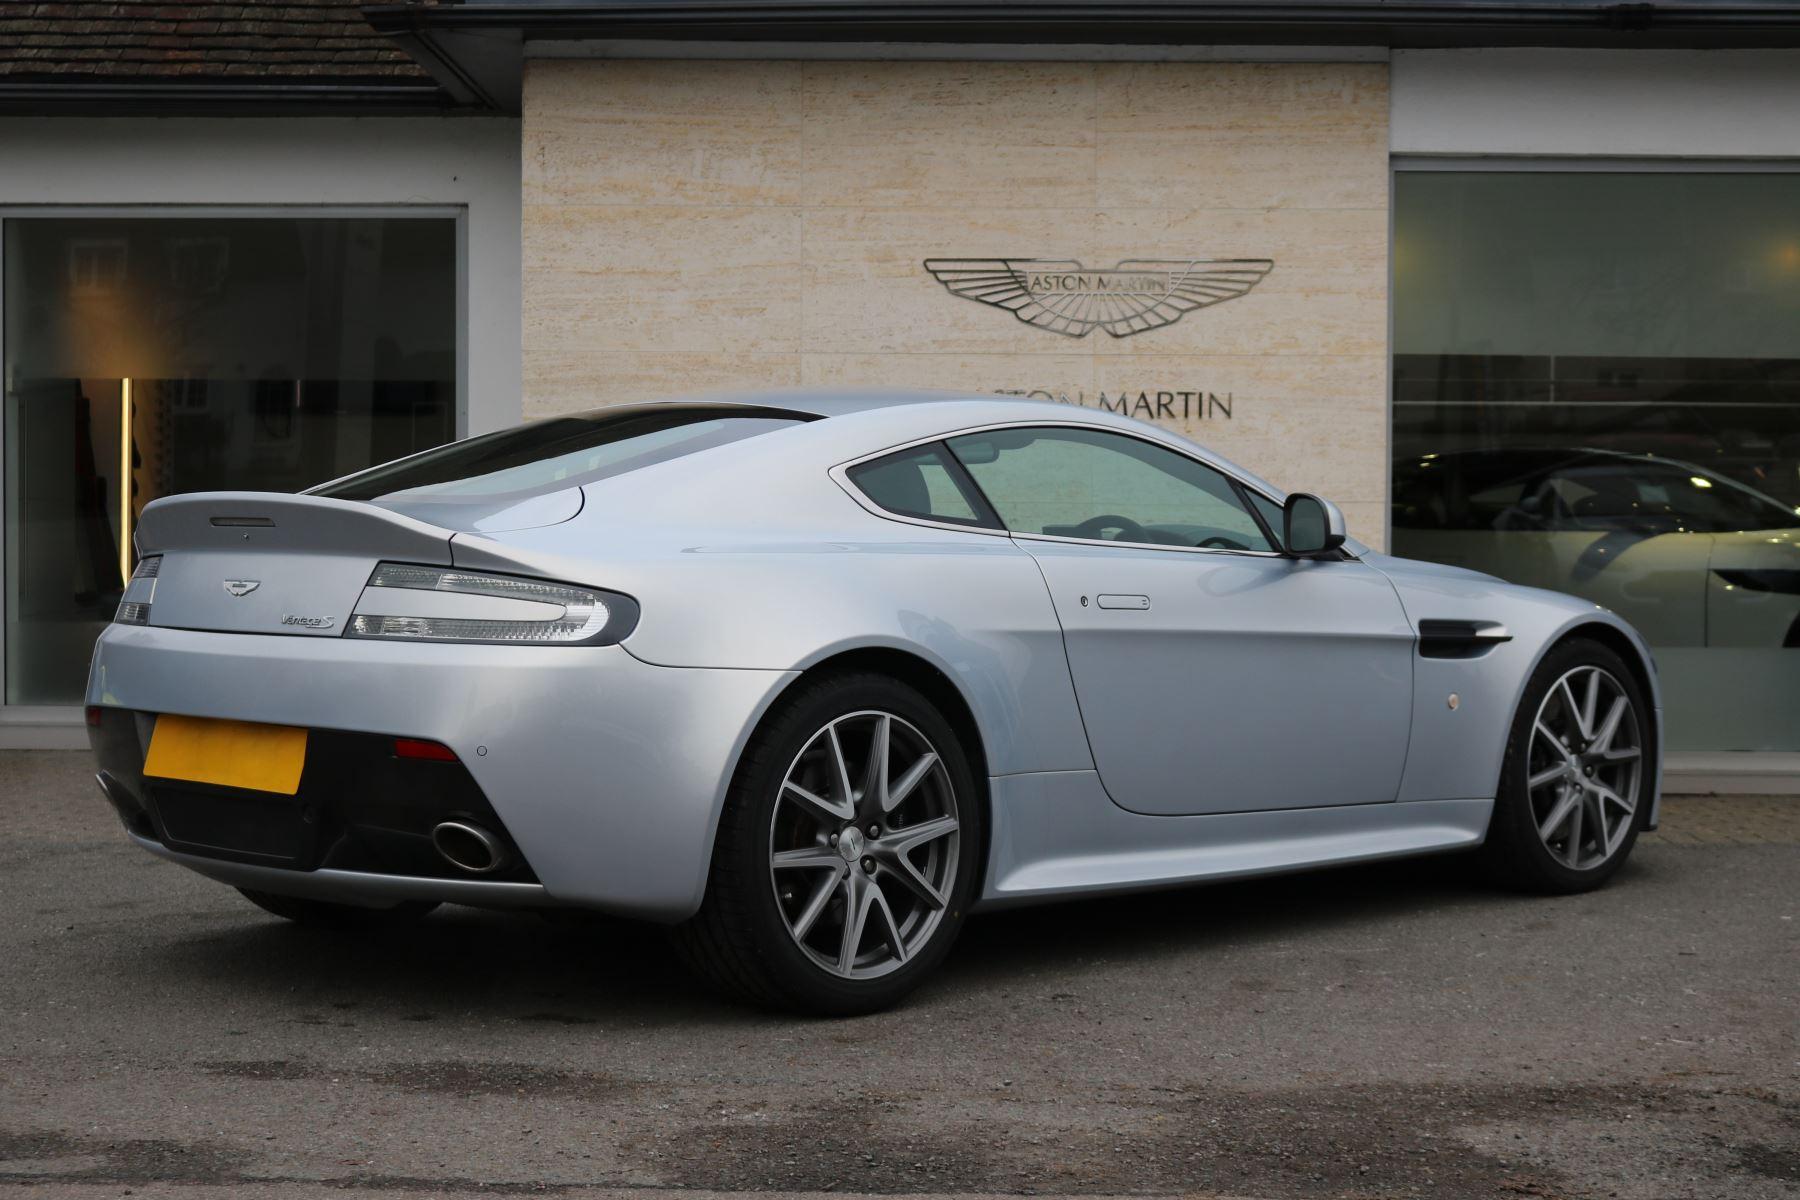 Aston Martin V8 Vantage S Coupe S 2dr Sportshift 4 7 Automatic 3